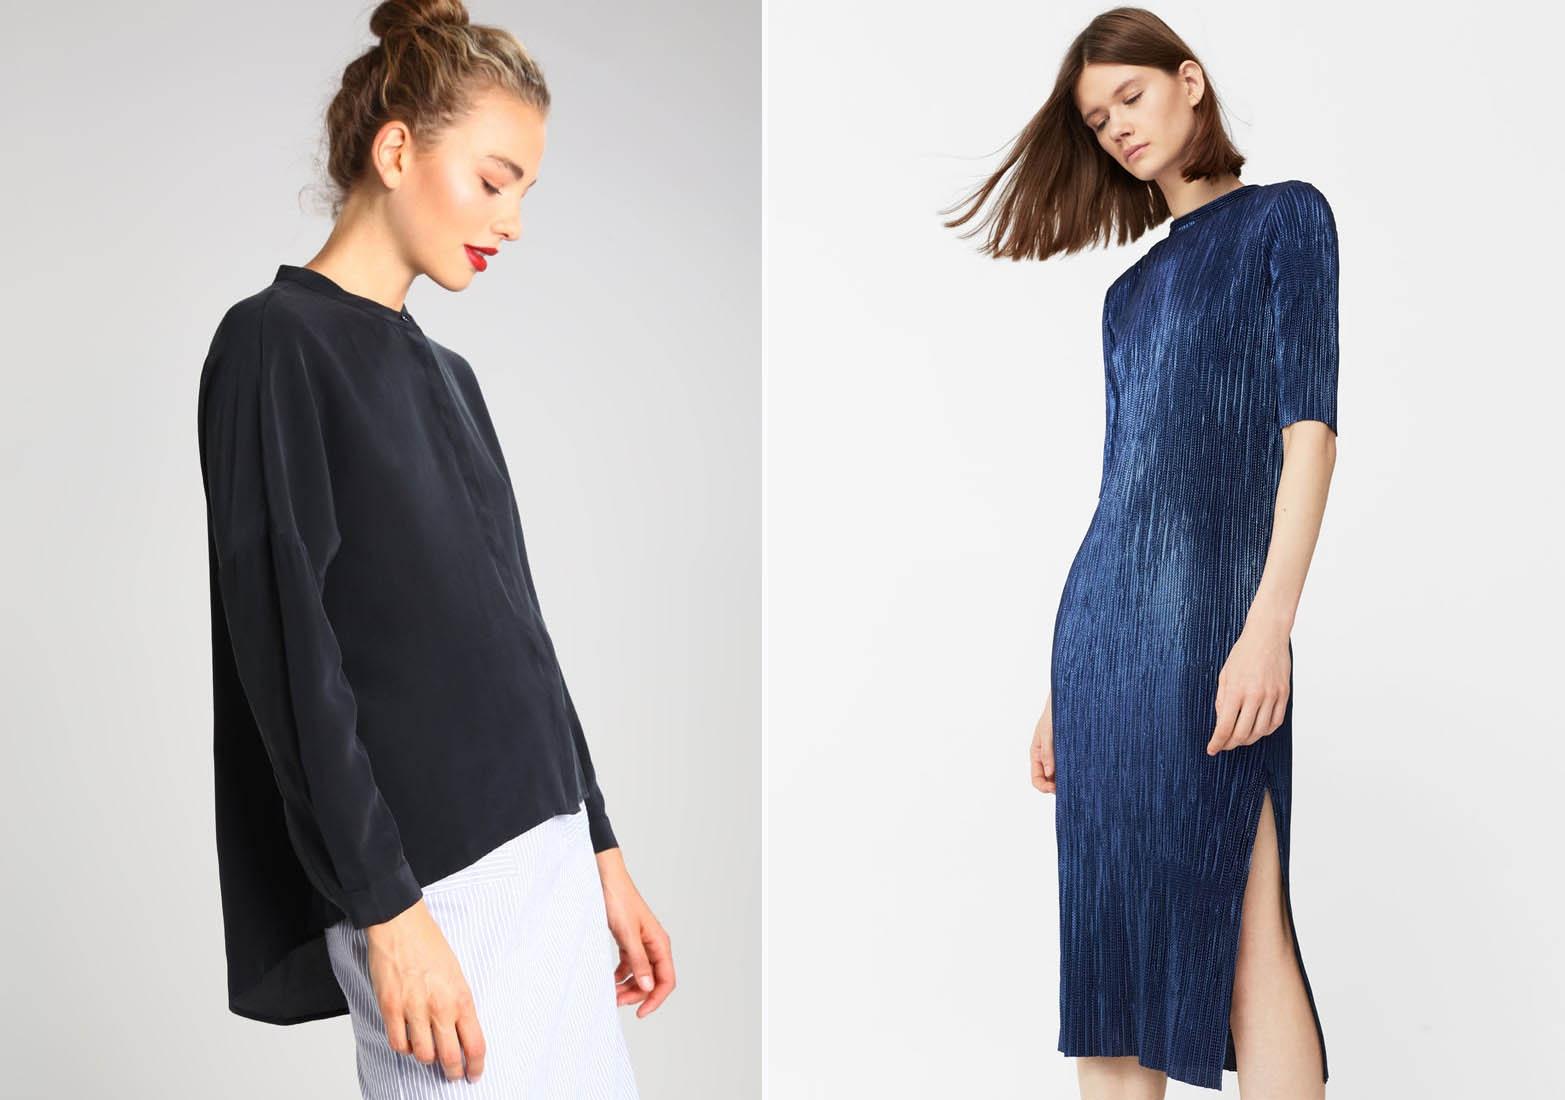 Shoppen: 7x een vleugje Azië in je kledingkast